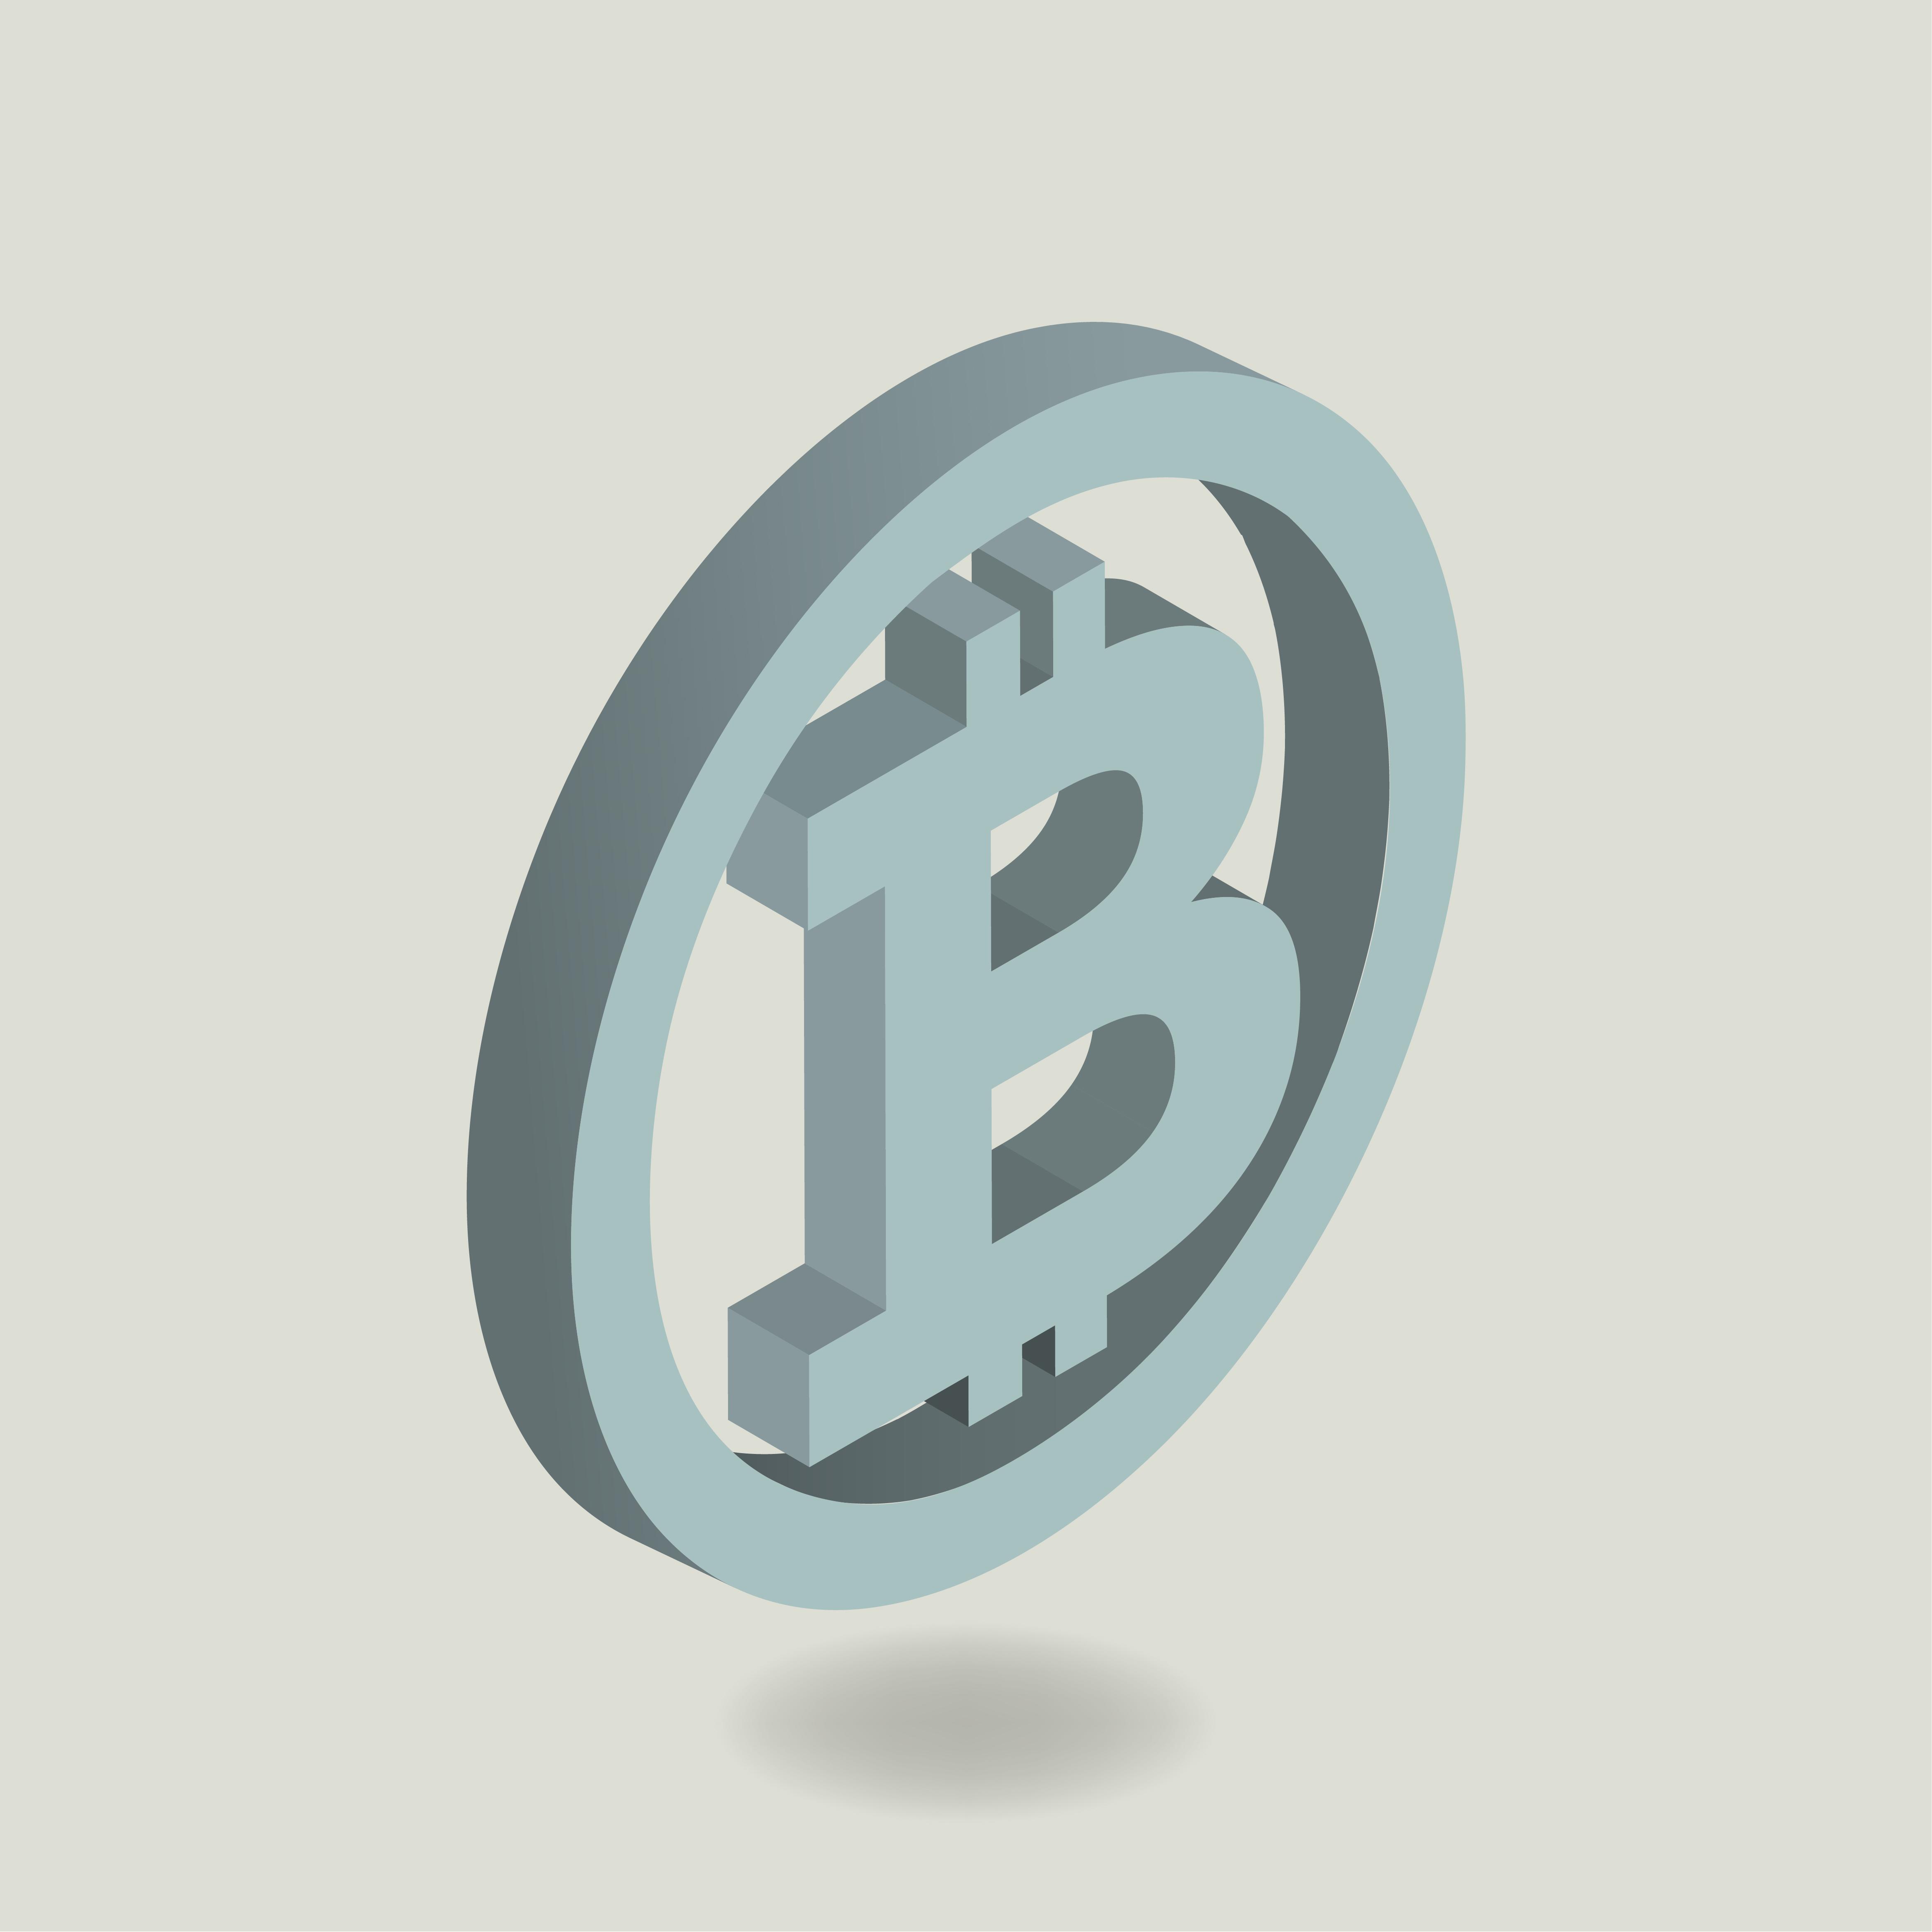 Vector icon of bitcoin icon - Download Free Vectors, Clipart Graphics & Vector Art